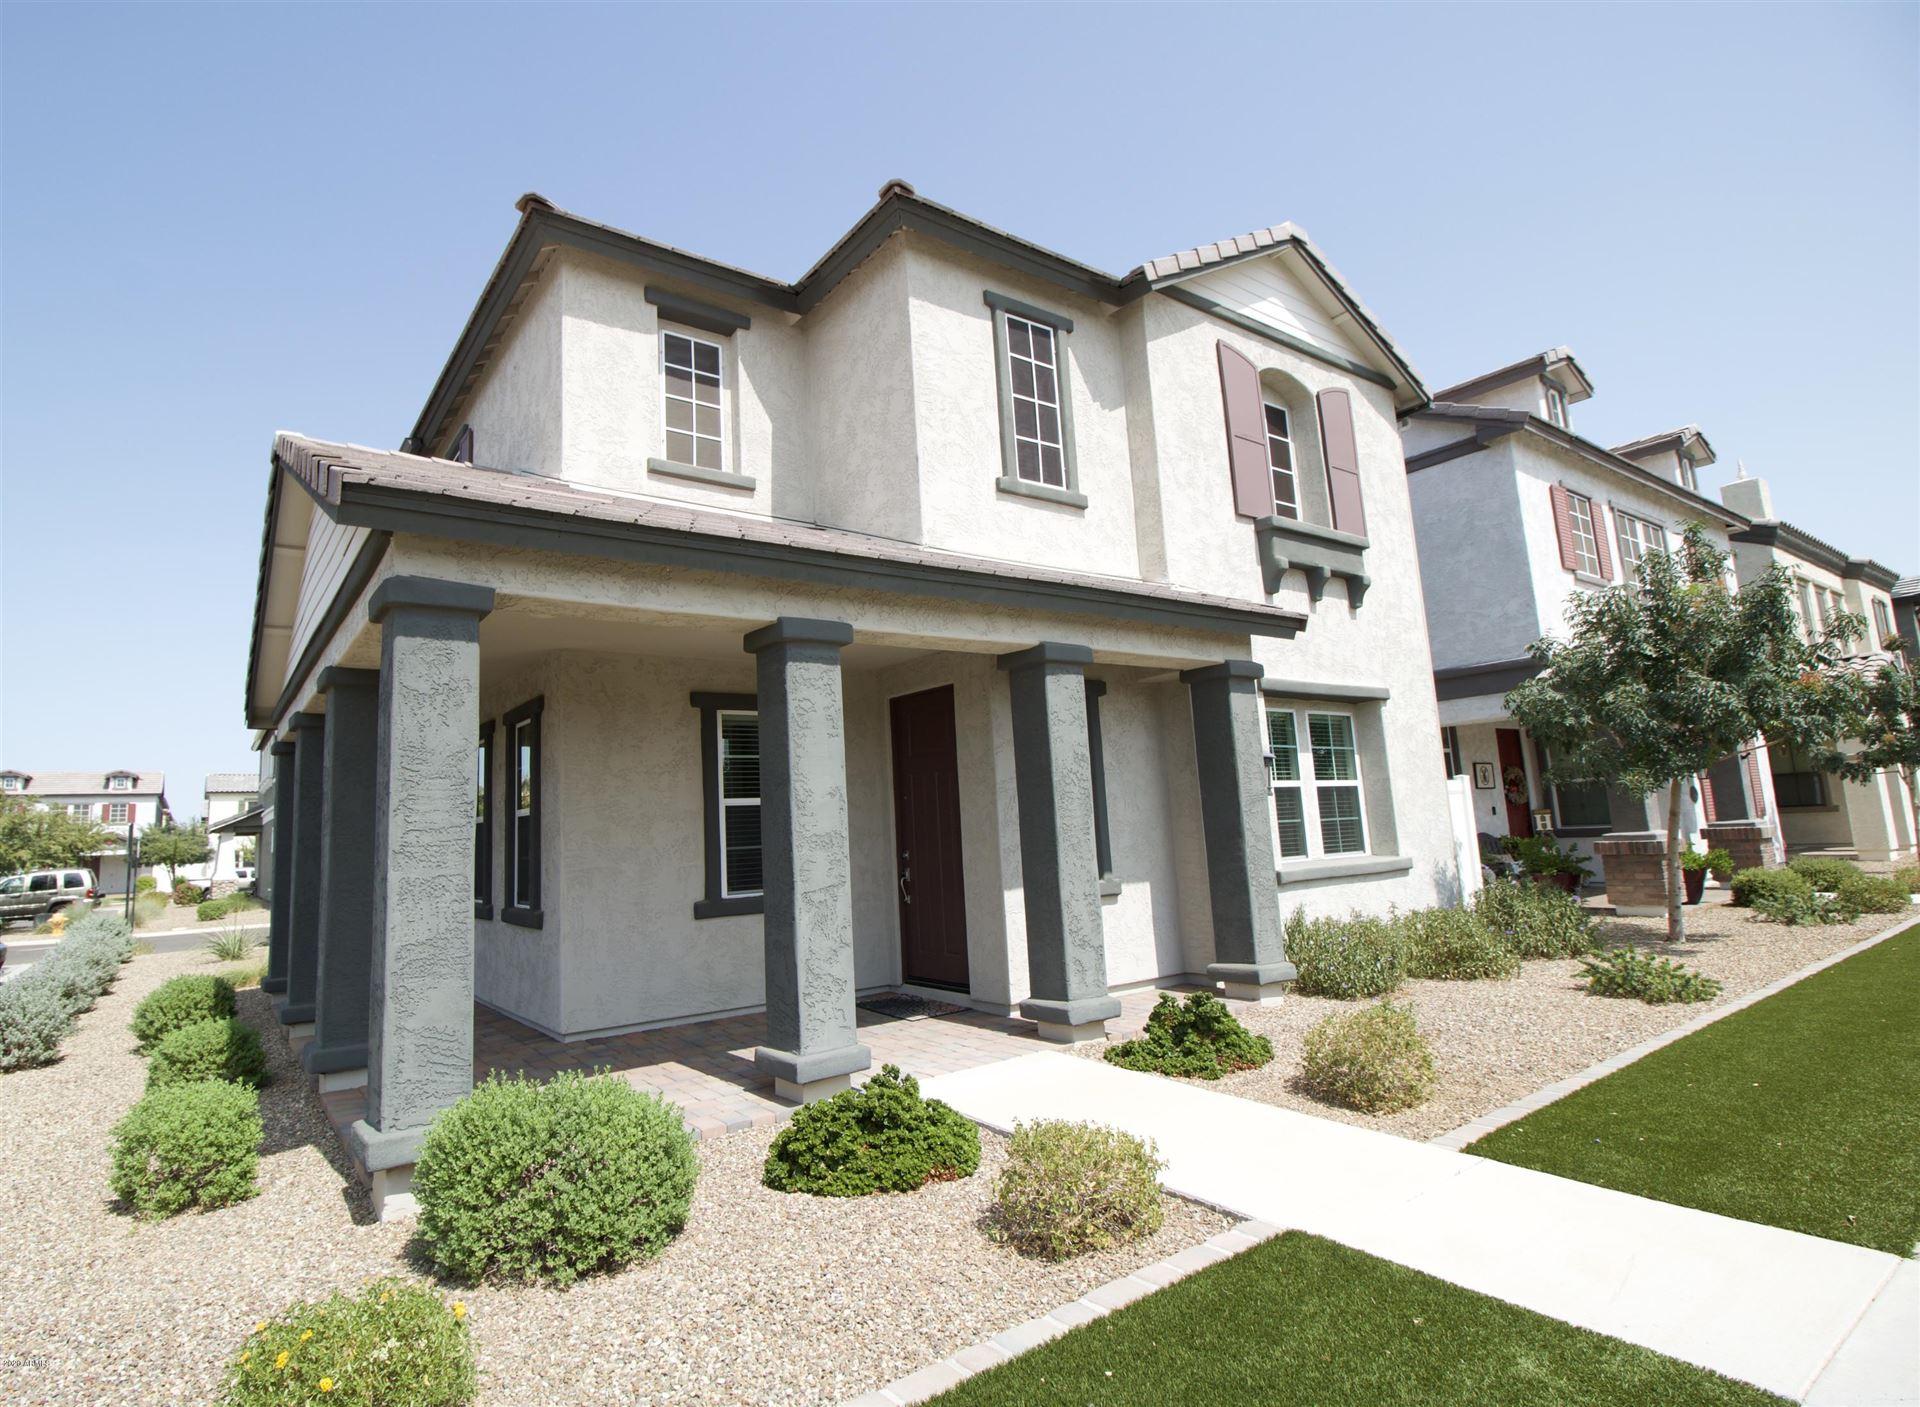 10417 E NARANJA Avenue, Mesa, AZ 85209 - MLS#: 6134309